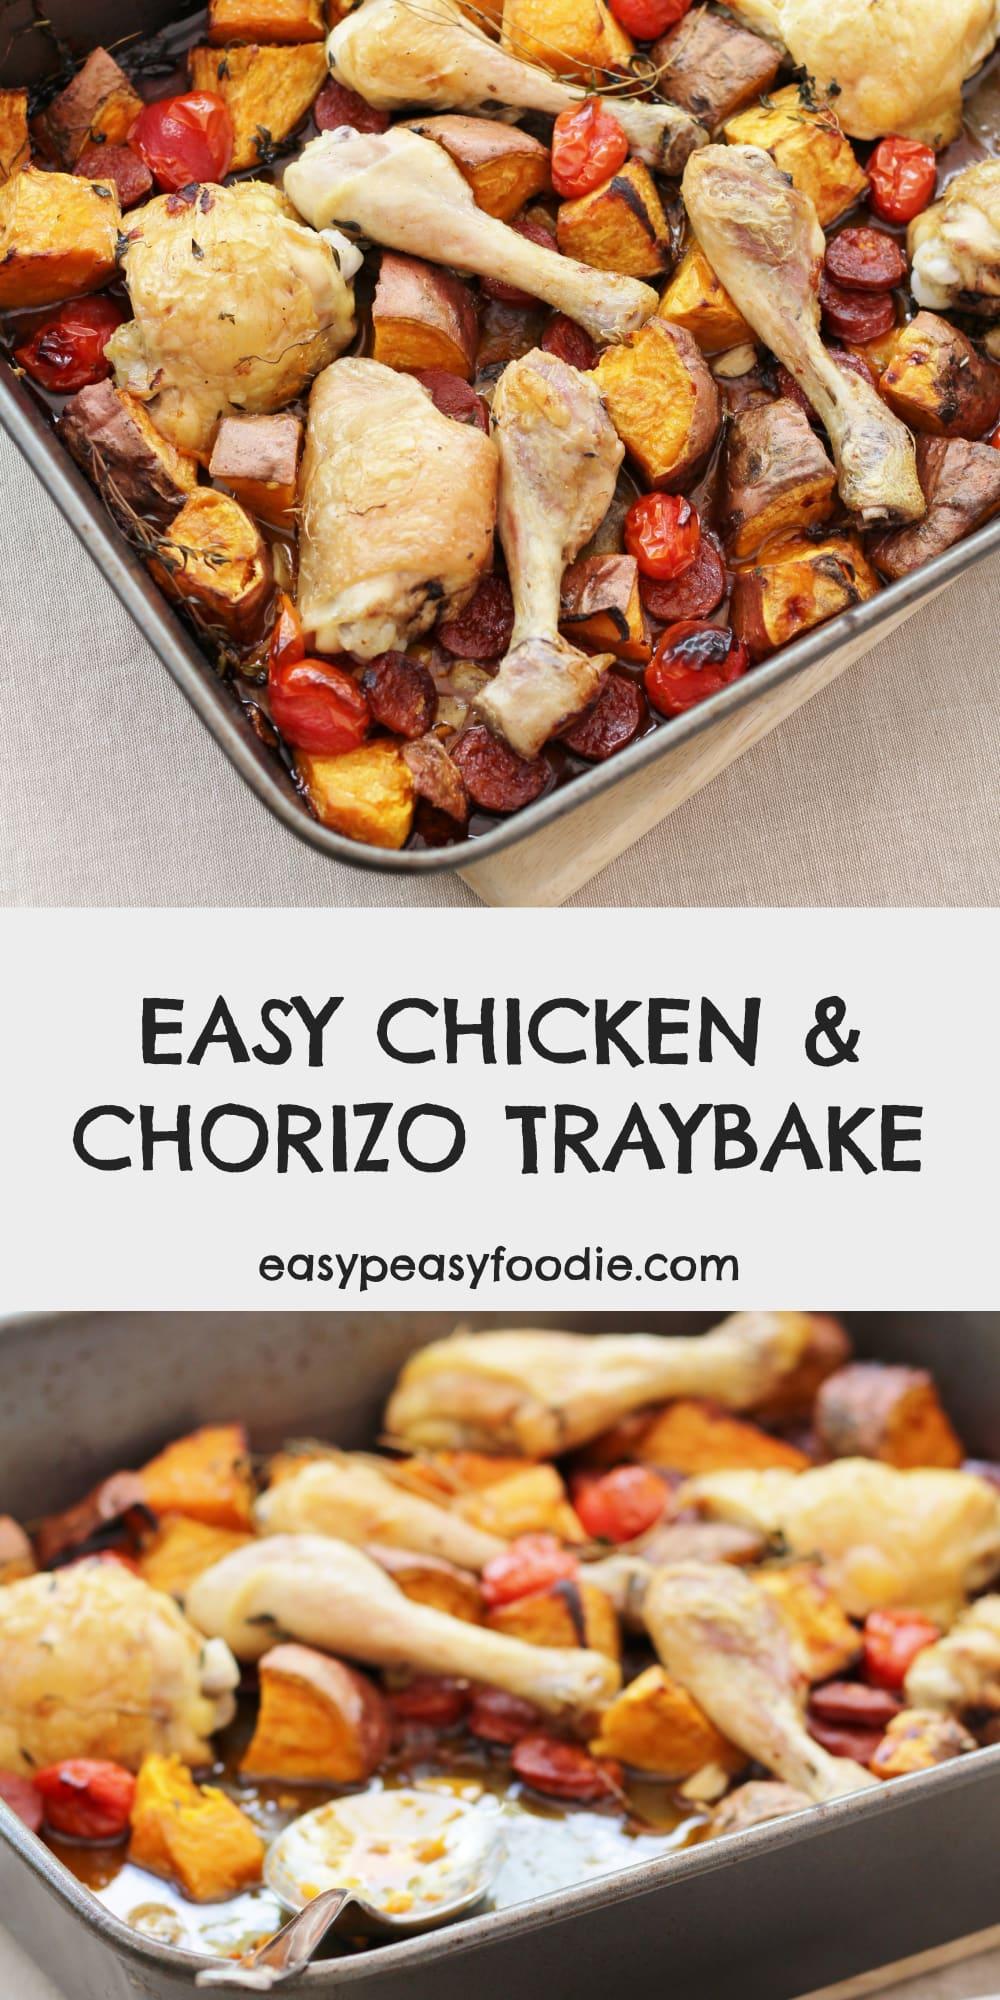 Chicken, Chorizo and Sweet Potato Traybake - pinnable image on Pinterest